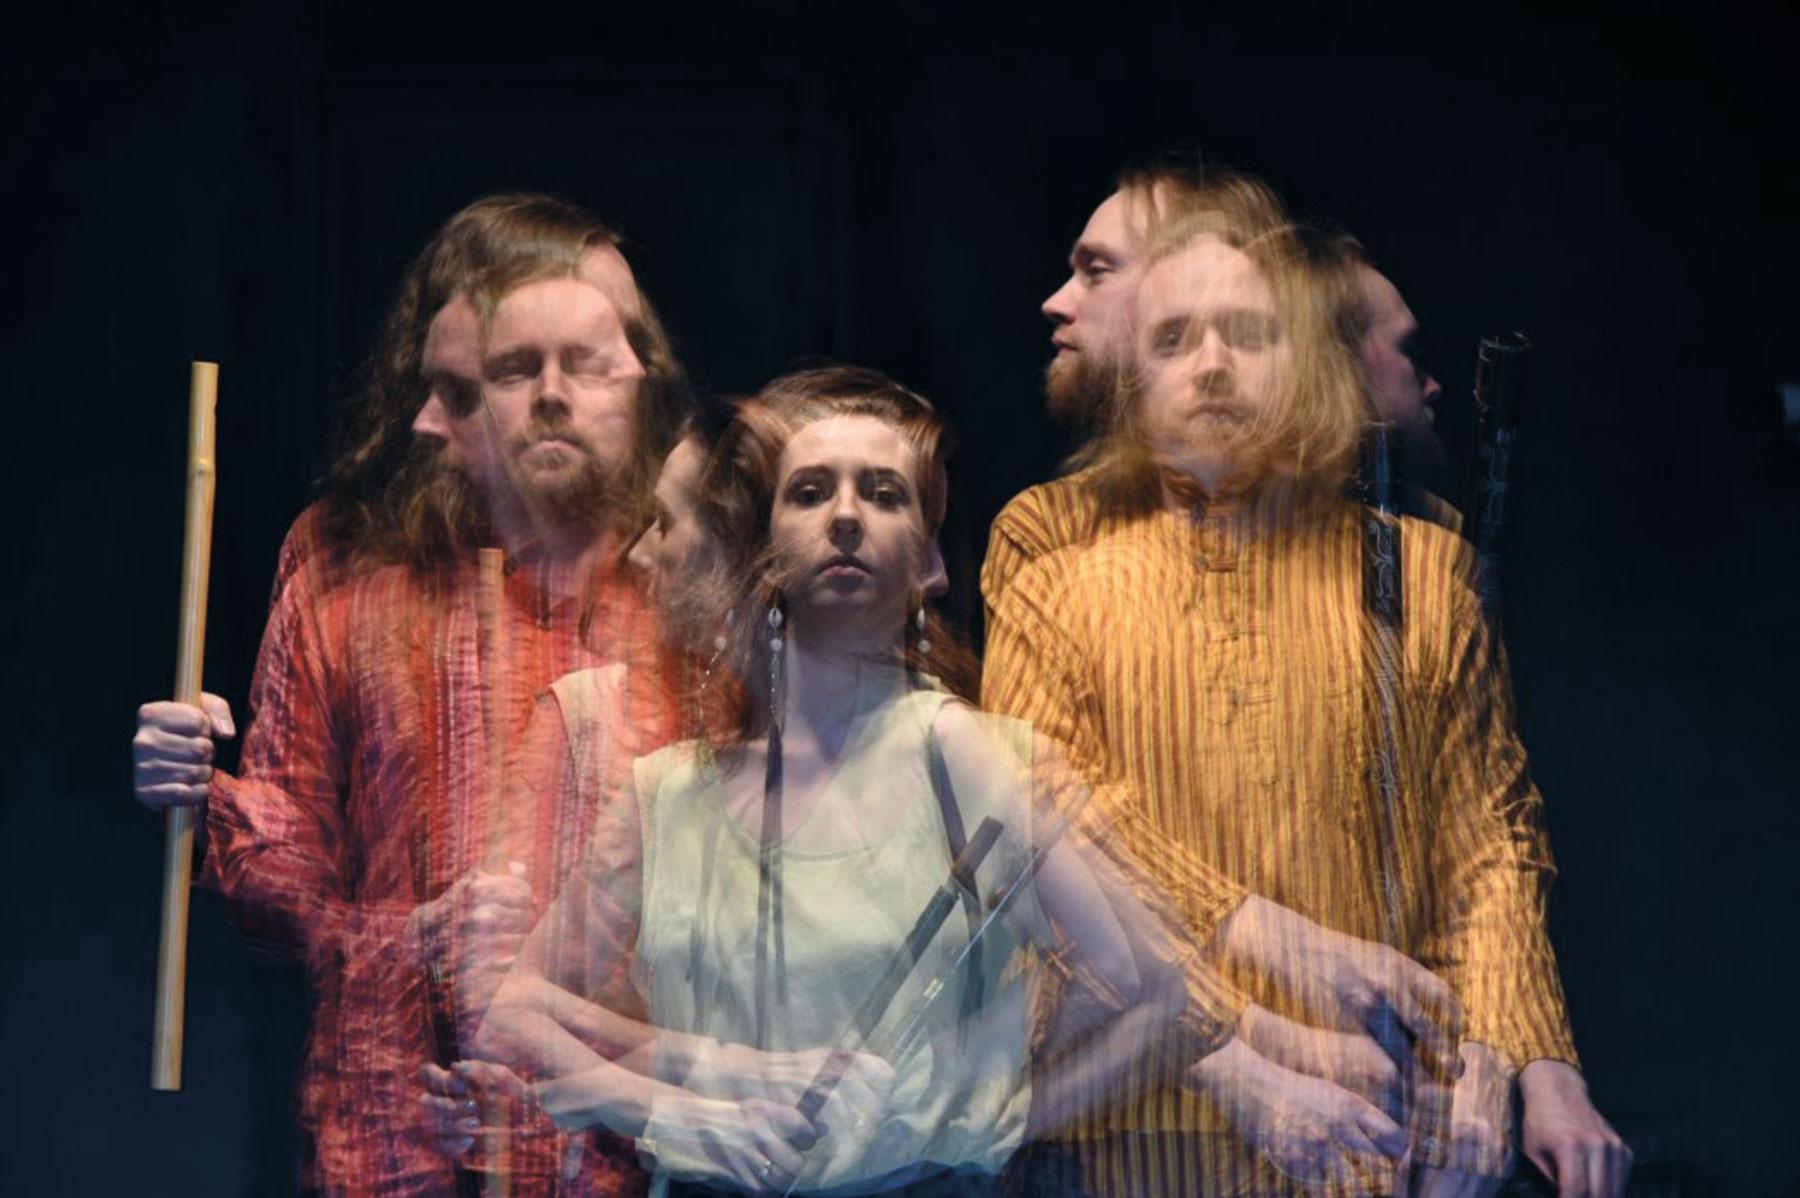 Ojajärvi Blom Ojajärvi -trio